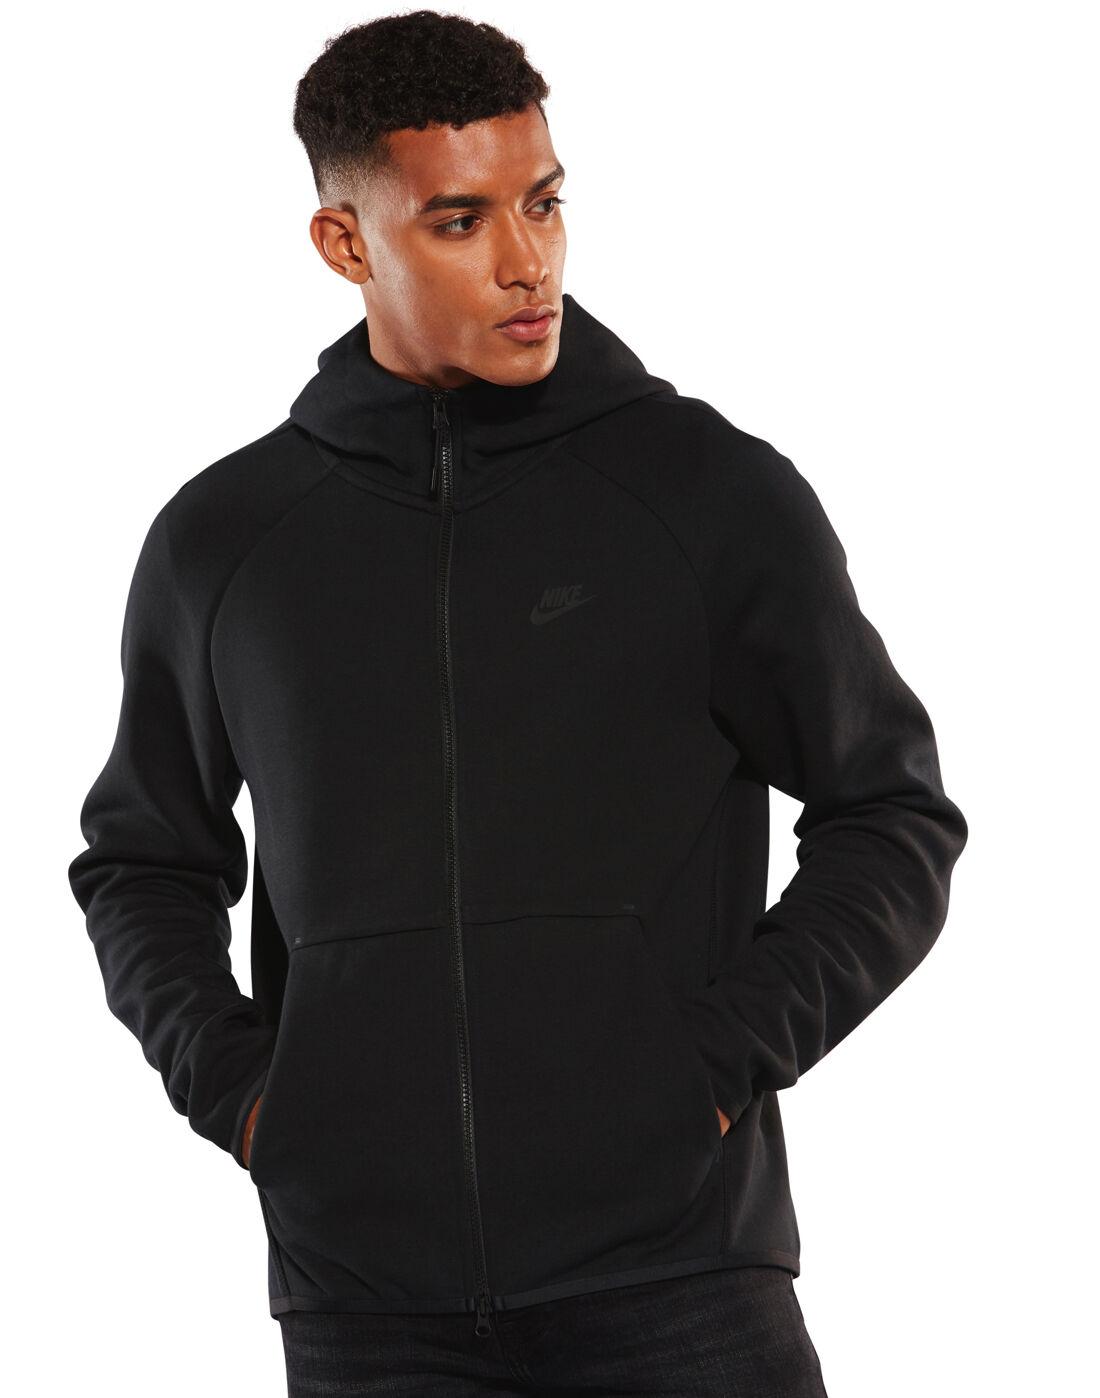 Nike Mens Tech Fleece Full Zip Hoodie